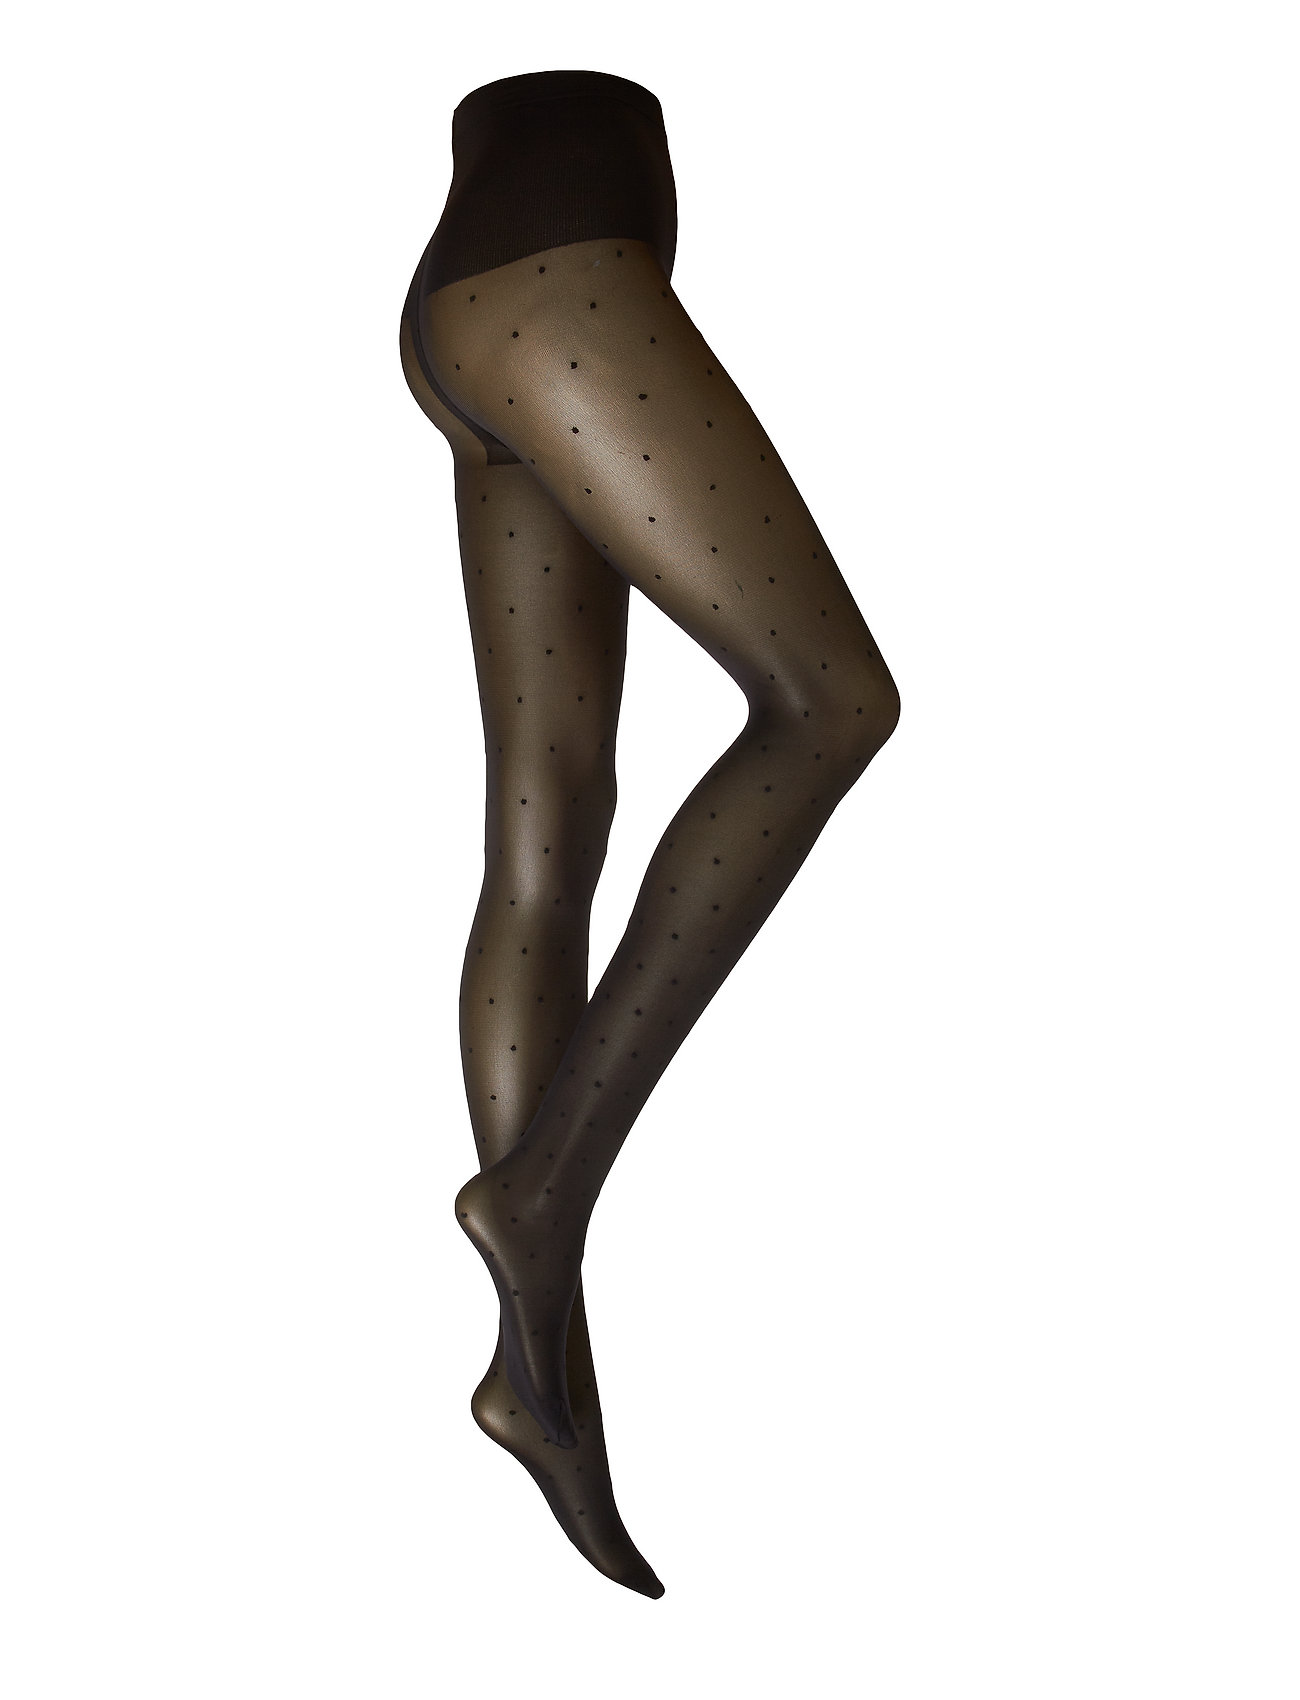 95c713446 Doris Dots Tights 40d (Black) (£19) - Swedish Stockings -